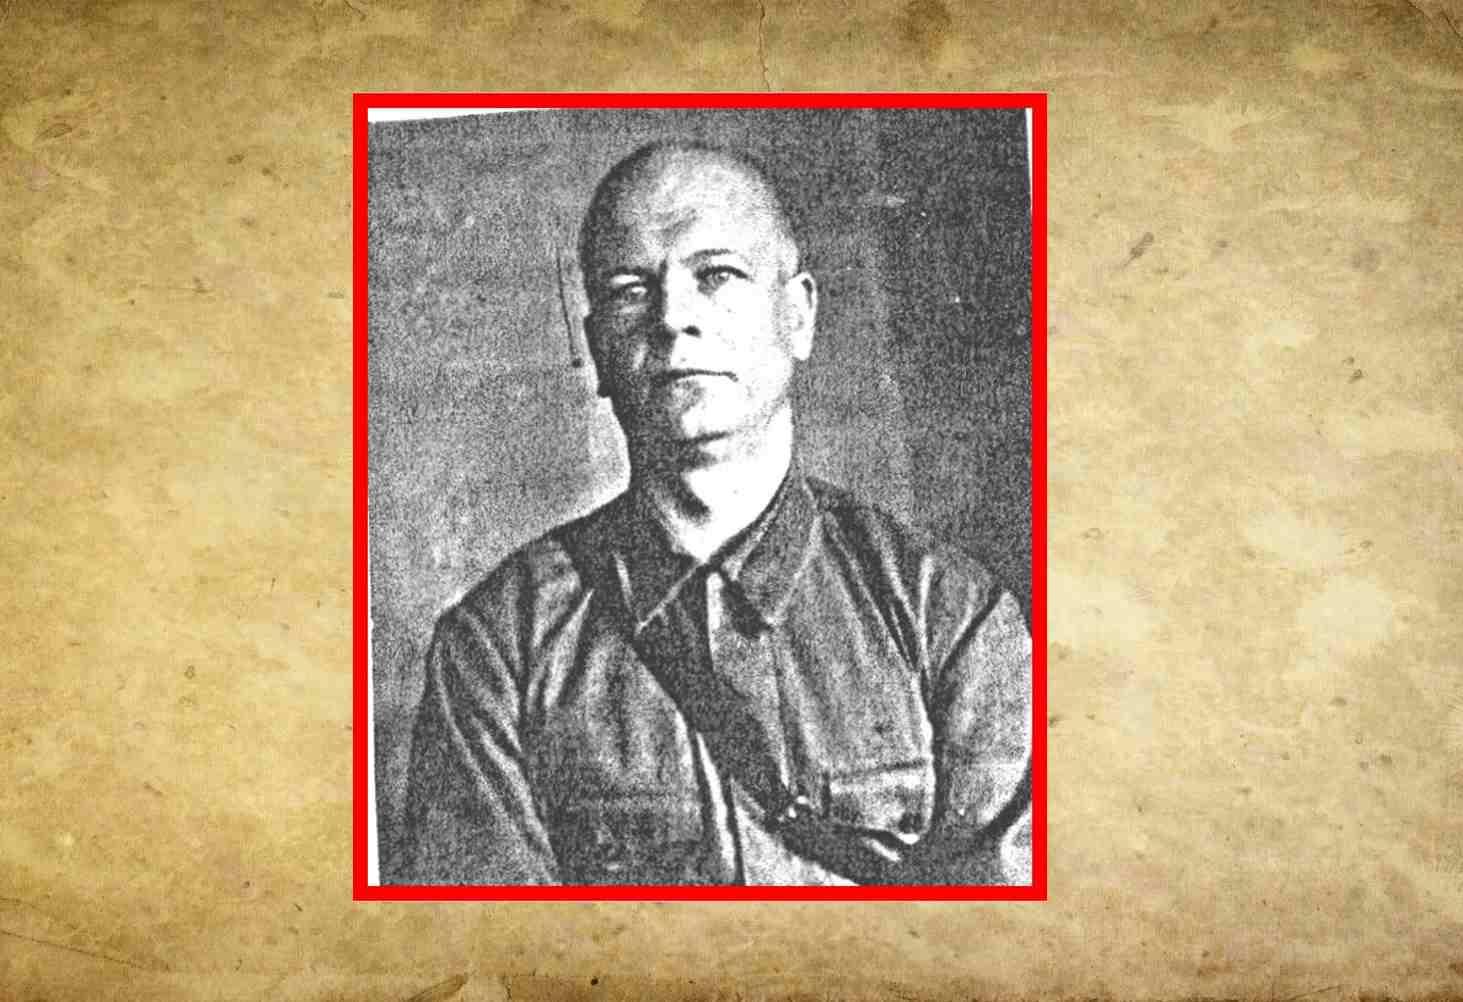 shmelev-konstantin-aleksandrovich